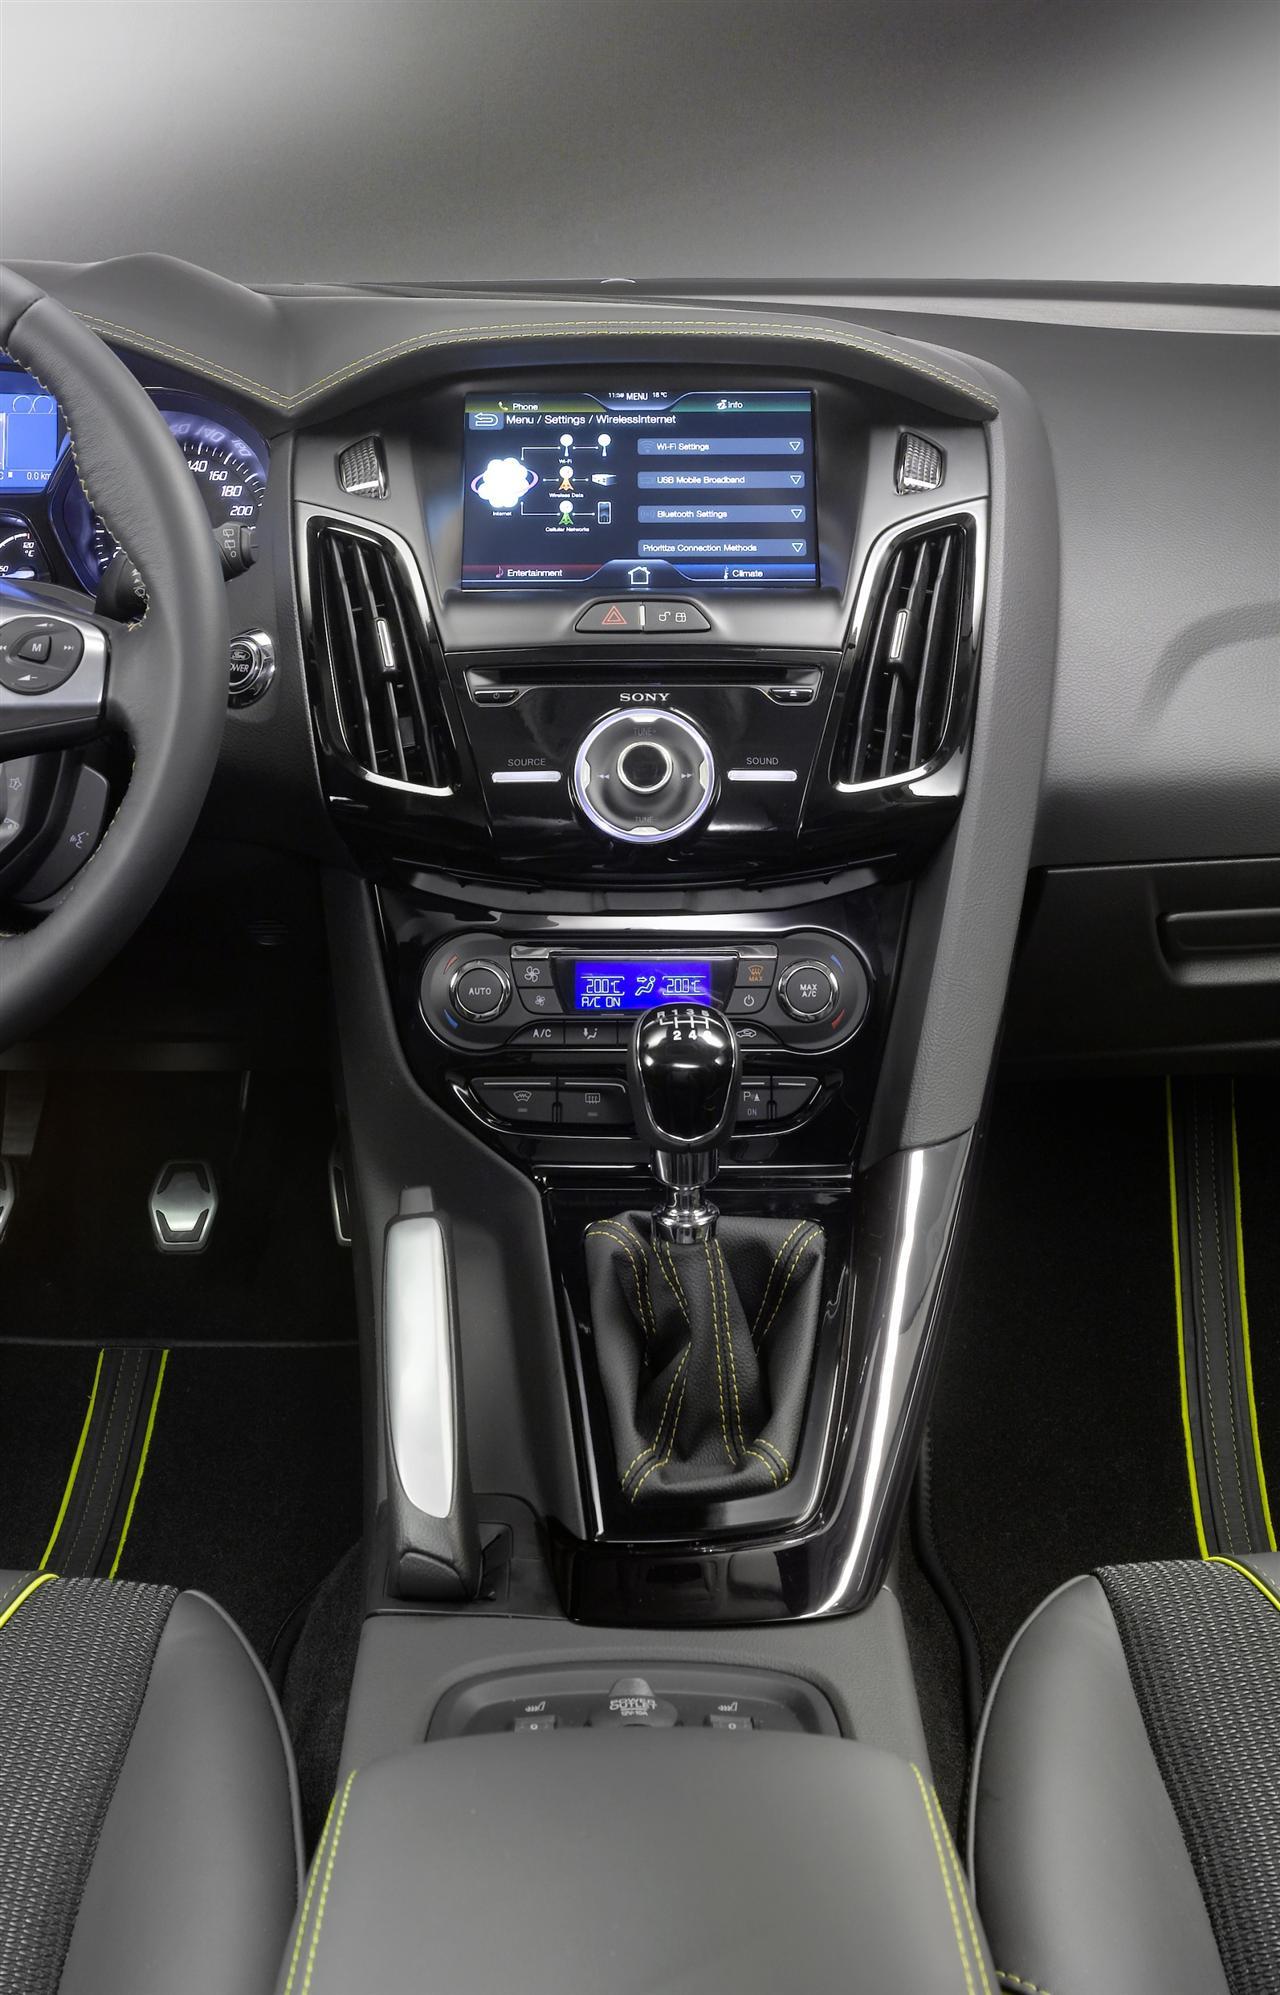 2012 Ford Focus Wagon